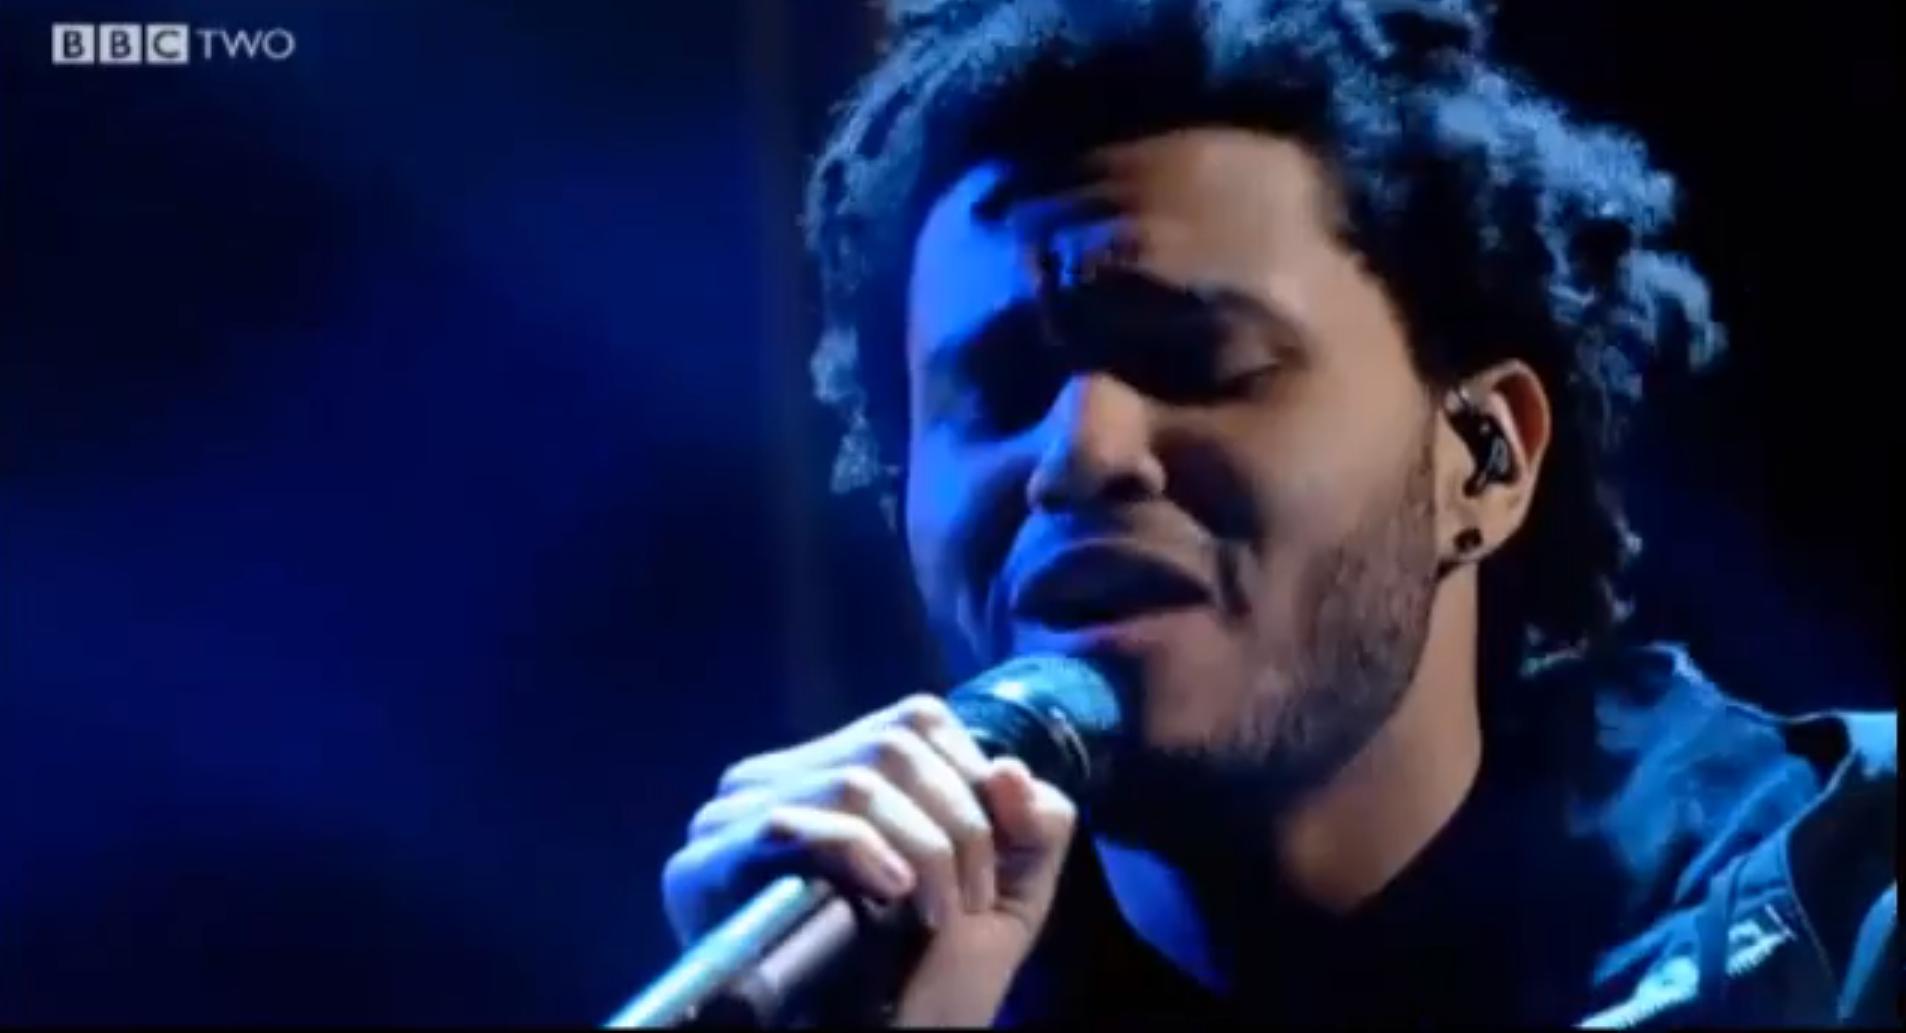 Watch The Weeknd&#8217;s TV Debut On <em>Jools Holland</em>